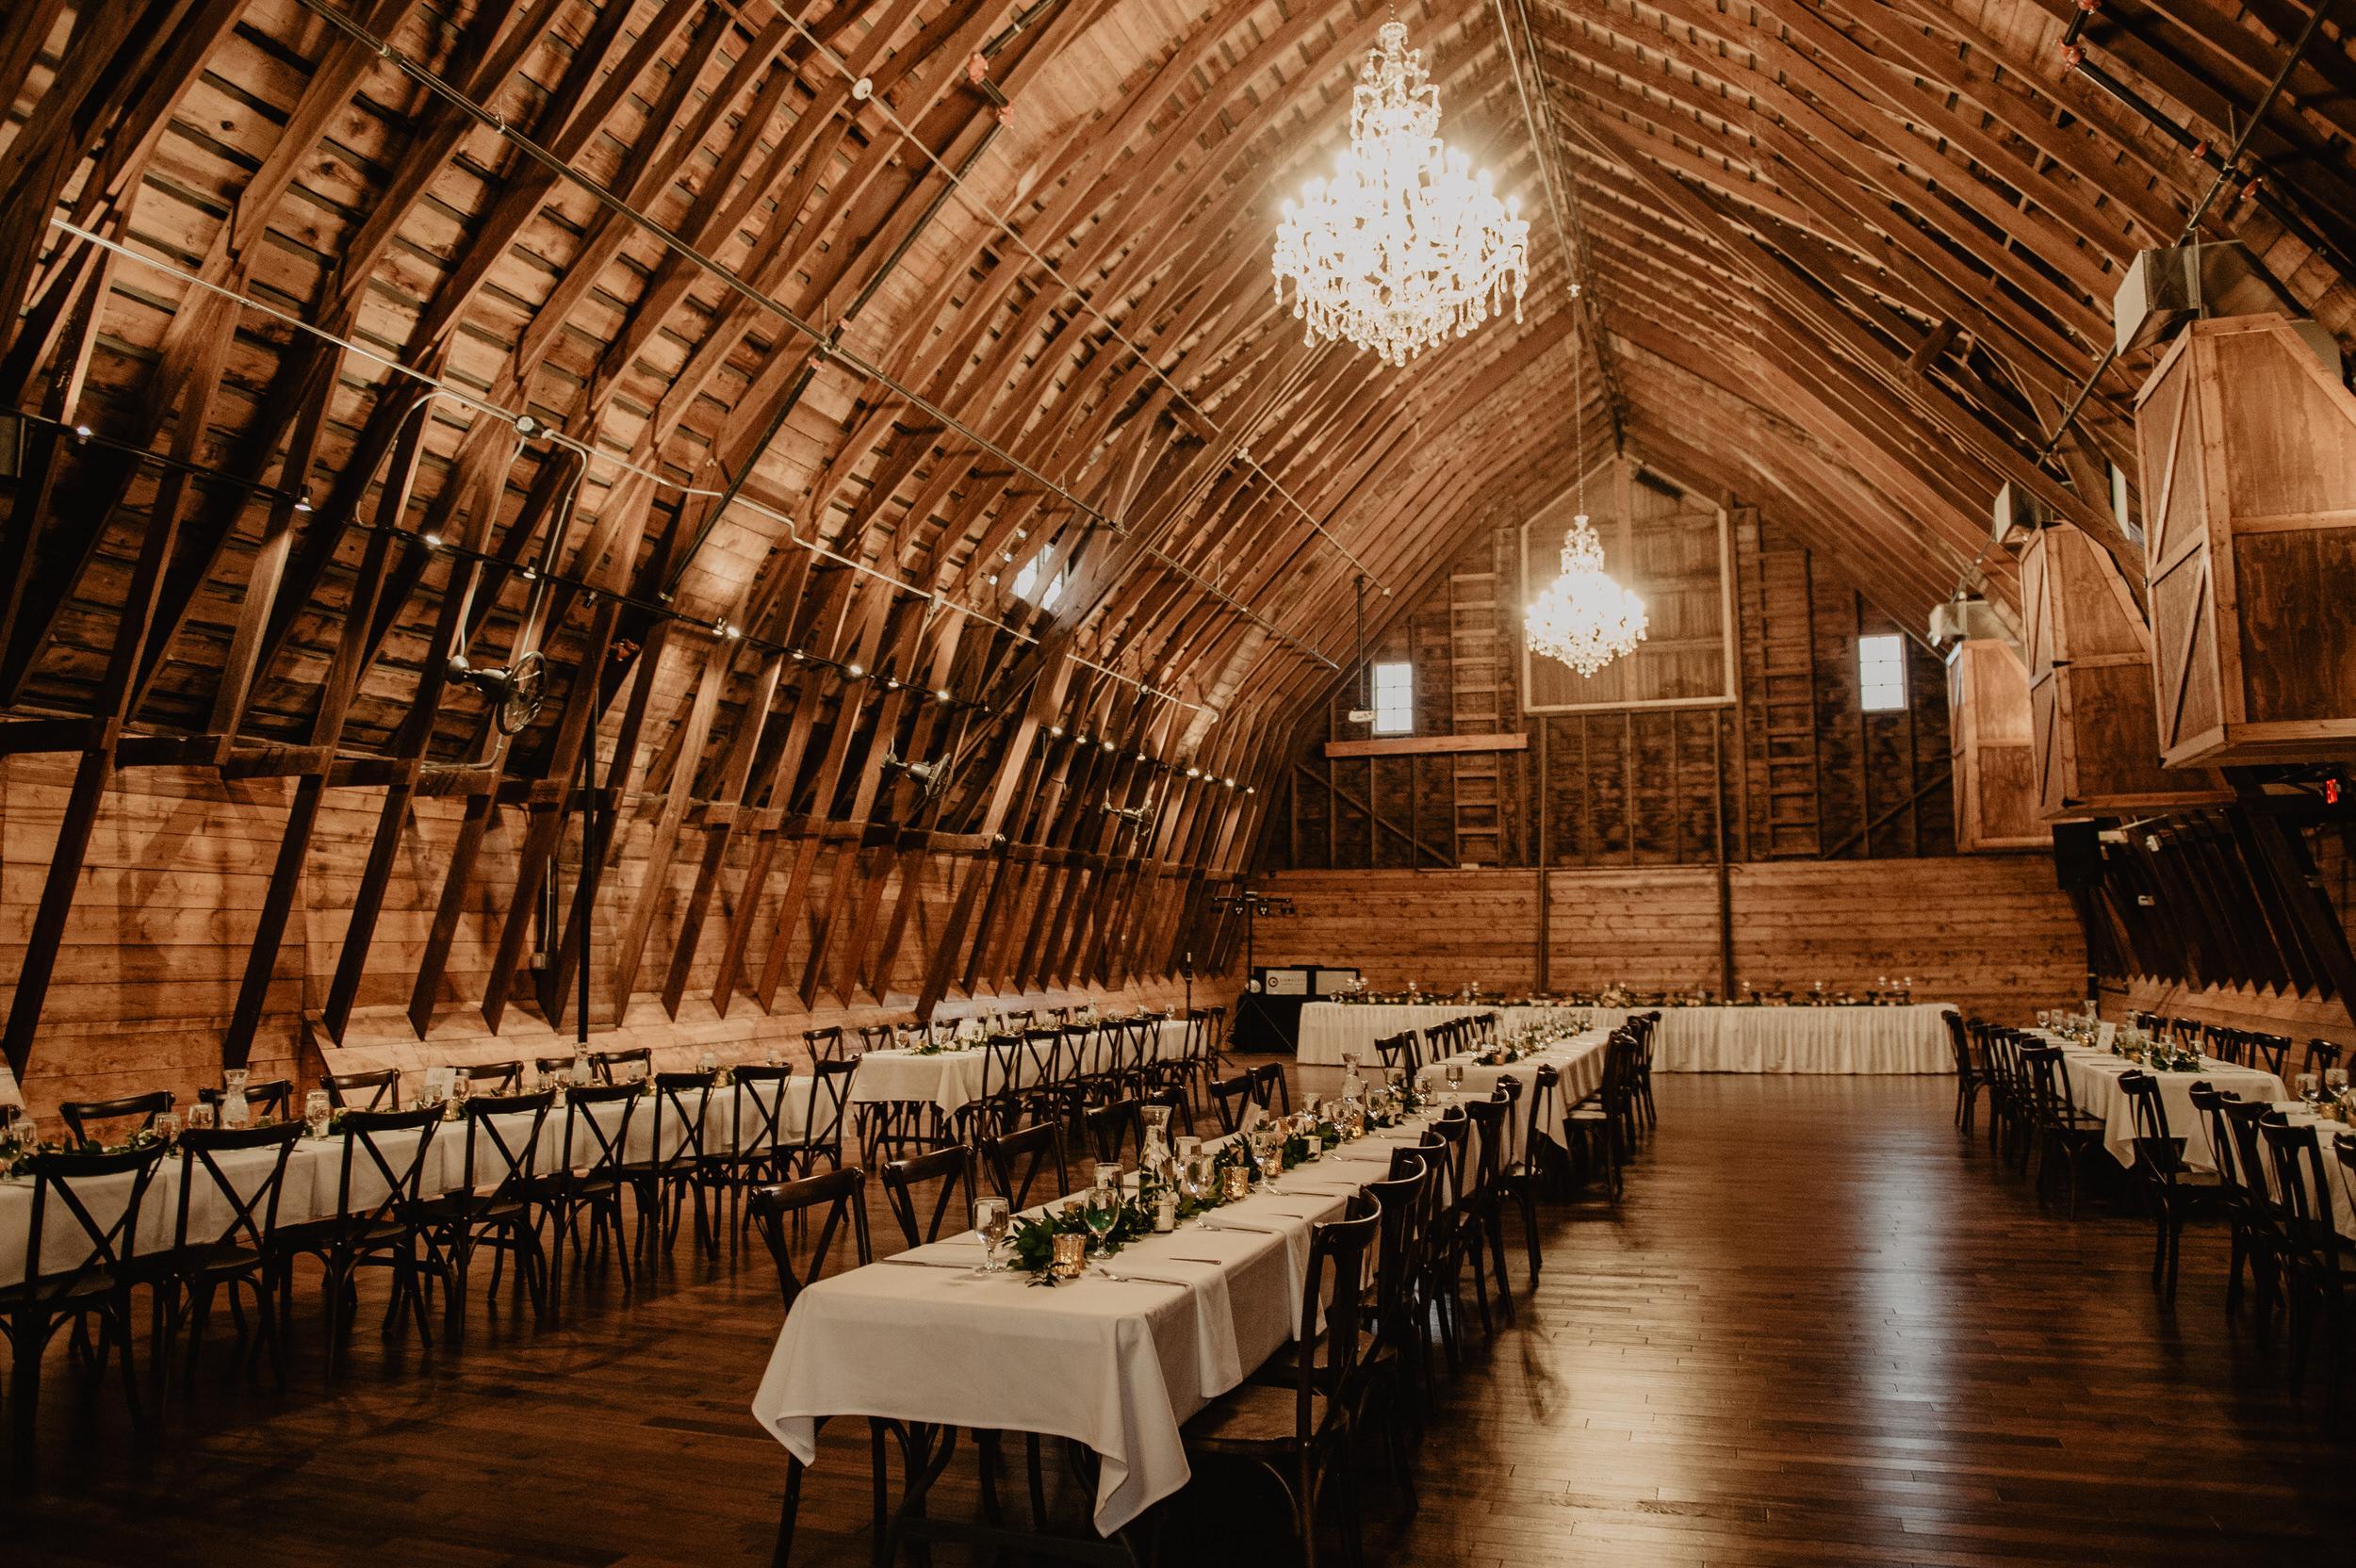 Barn Wedding Venues.Barn Wedding Venues In Nebraska Kaylie Sirek Nebraska Colorado